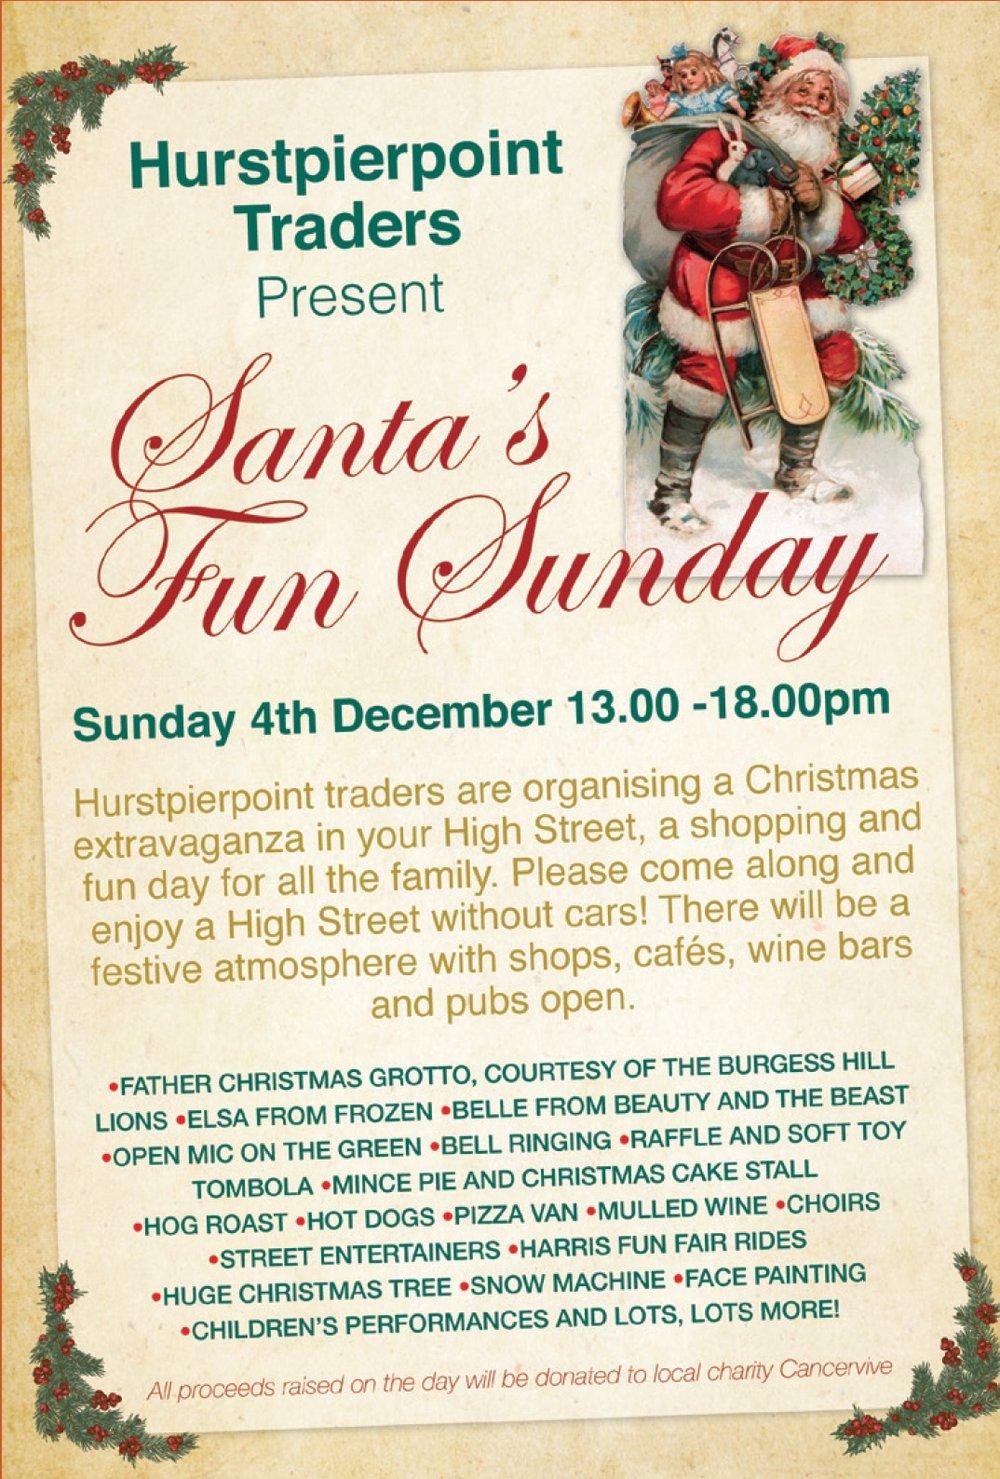 Hurstpierpoint Traders present Santa's Fun Sunday 2016